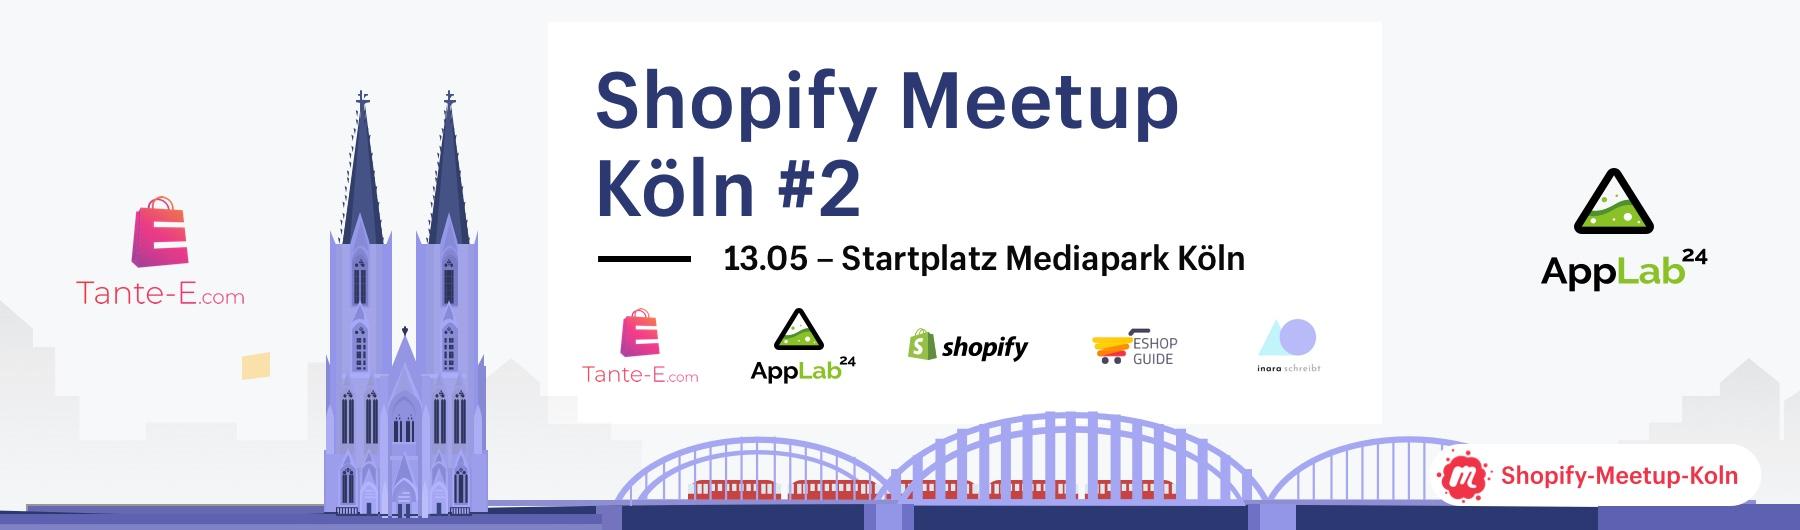 Shopify Meetup Köln #2